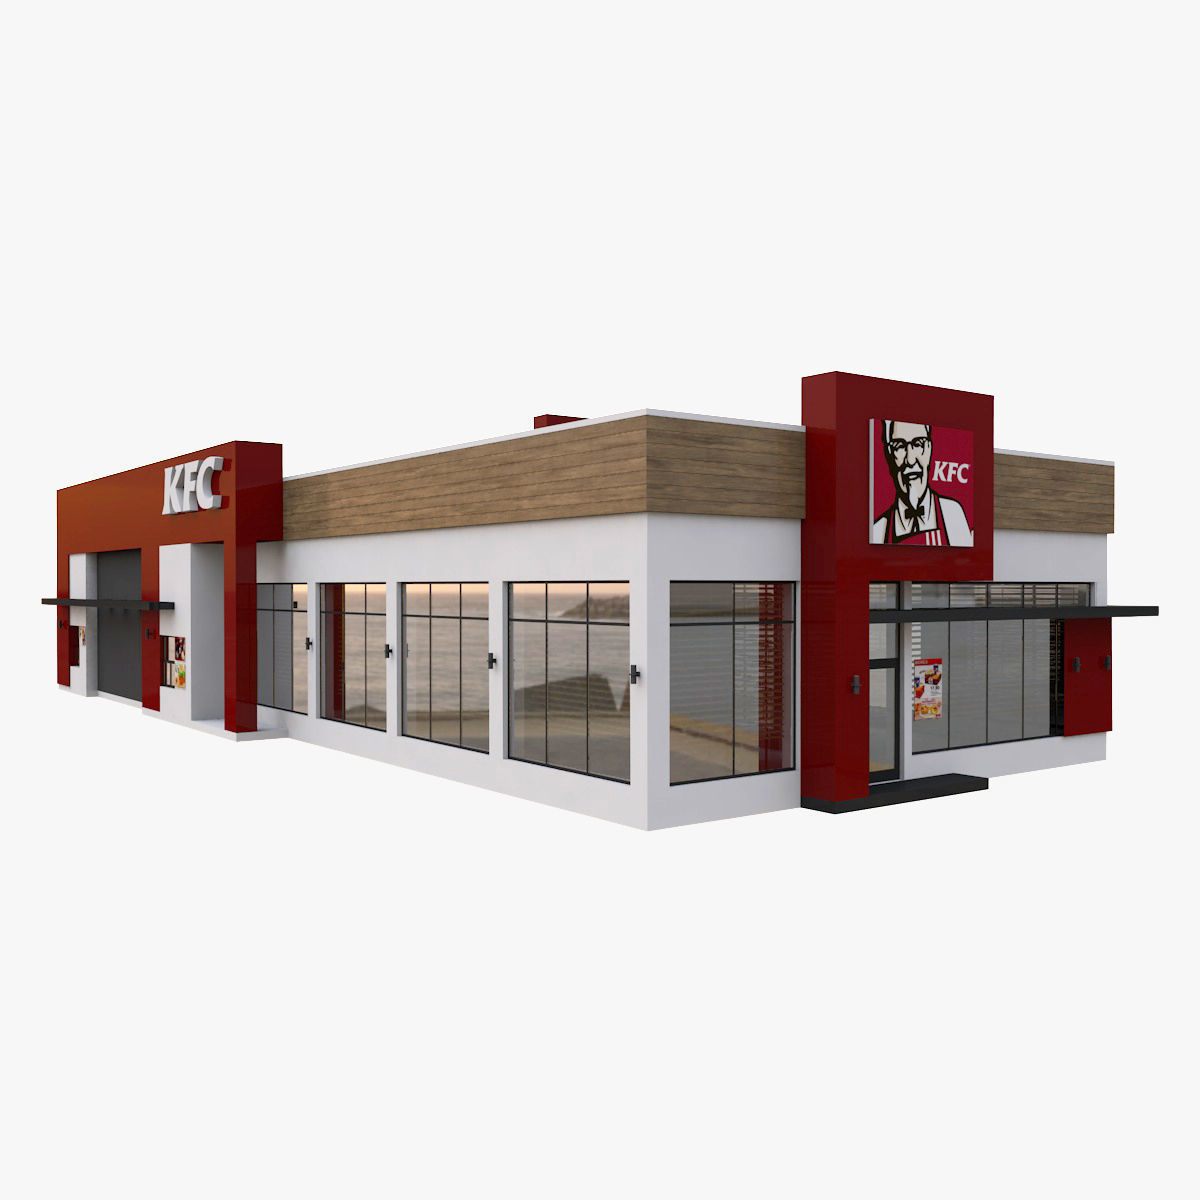 KFC Restaurant Drive Thru